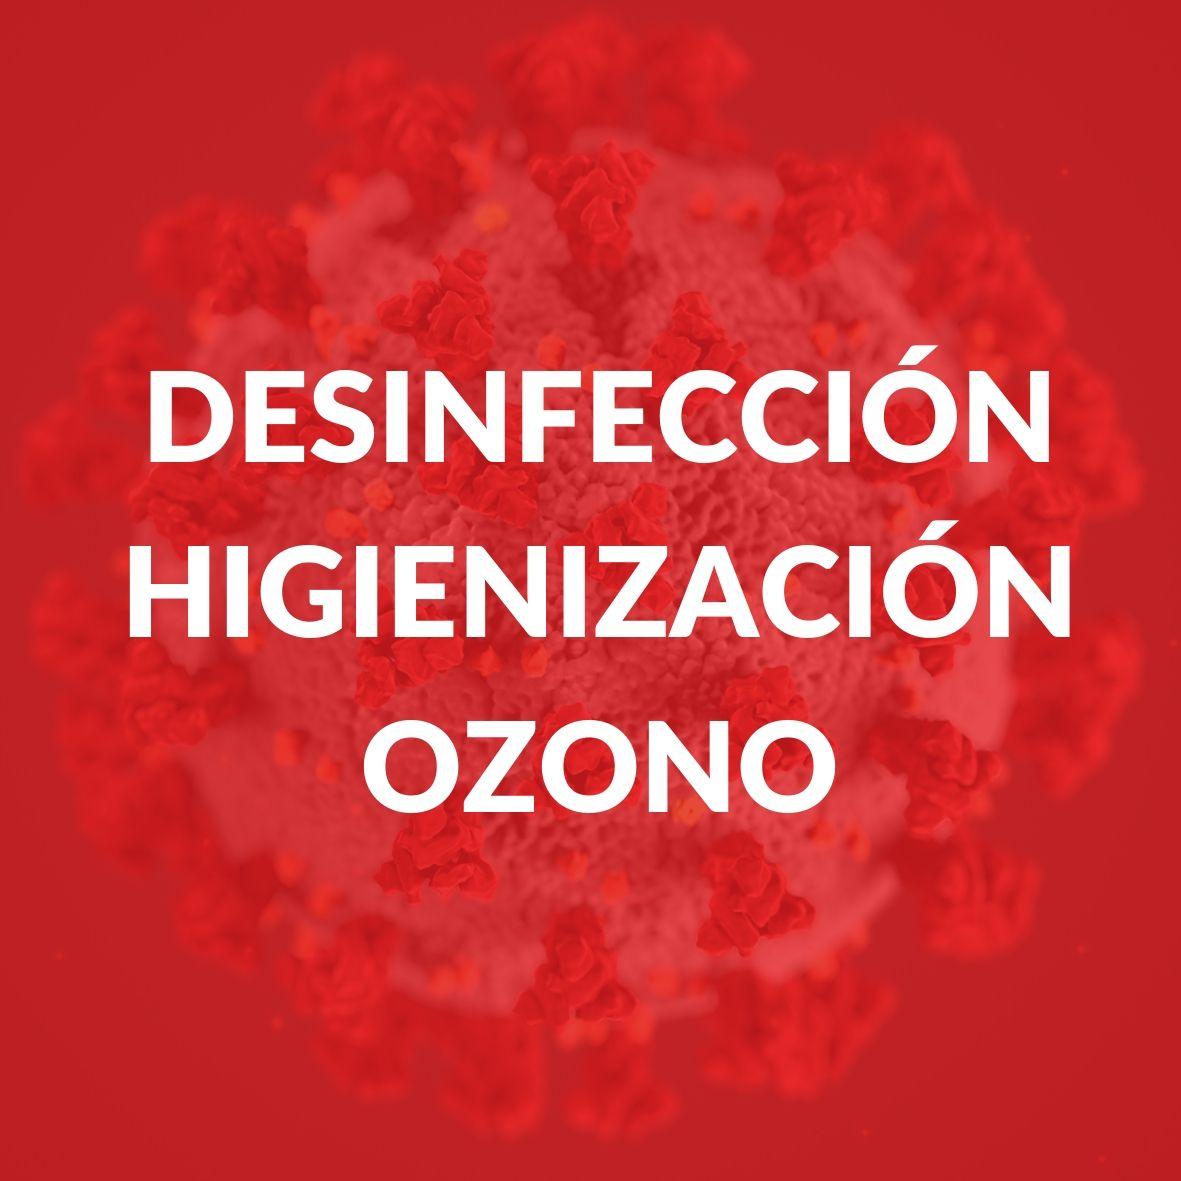 Desinfencción e higienización de vehículos en Gran Canaria